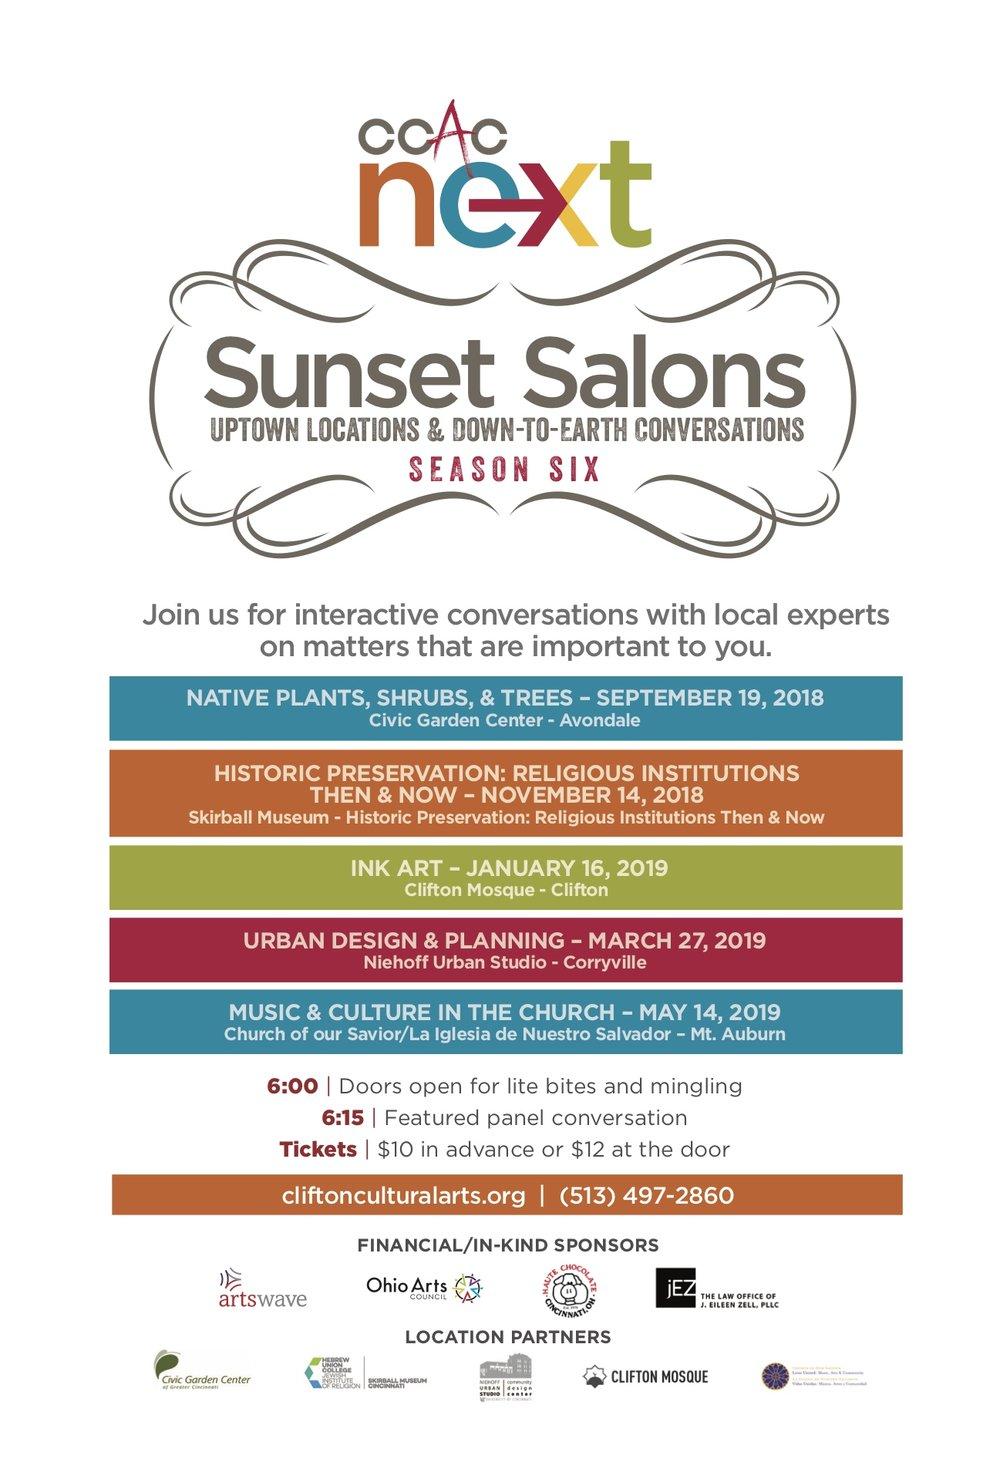 Sunset_Salons_Inkj.jpg